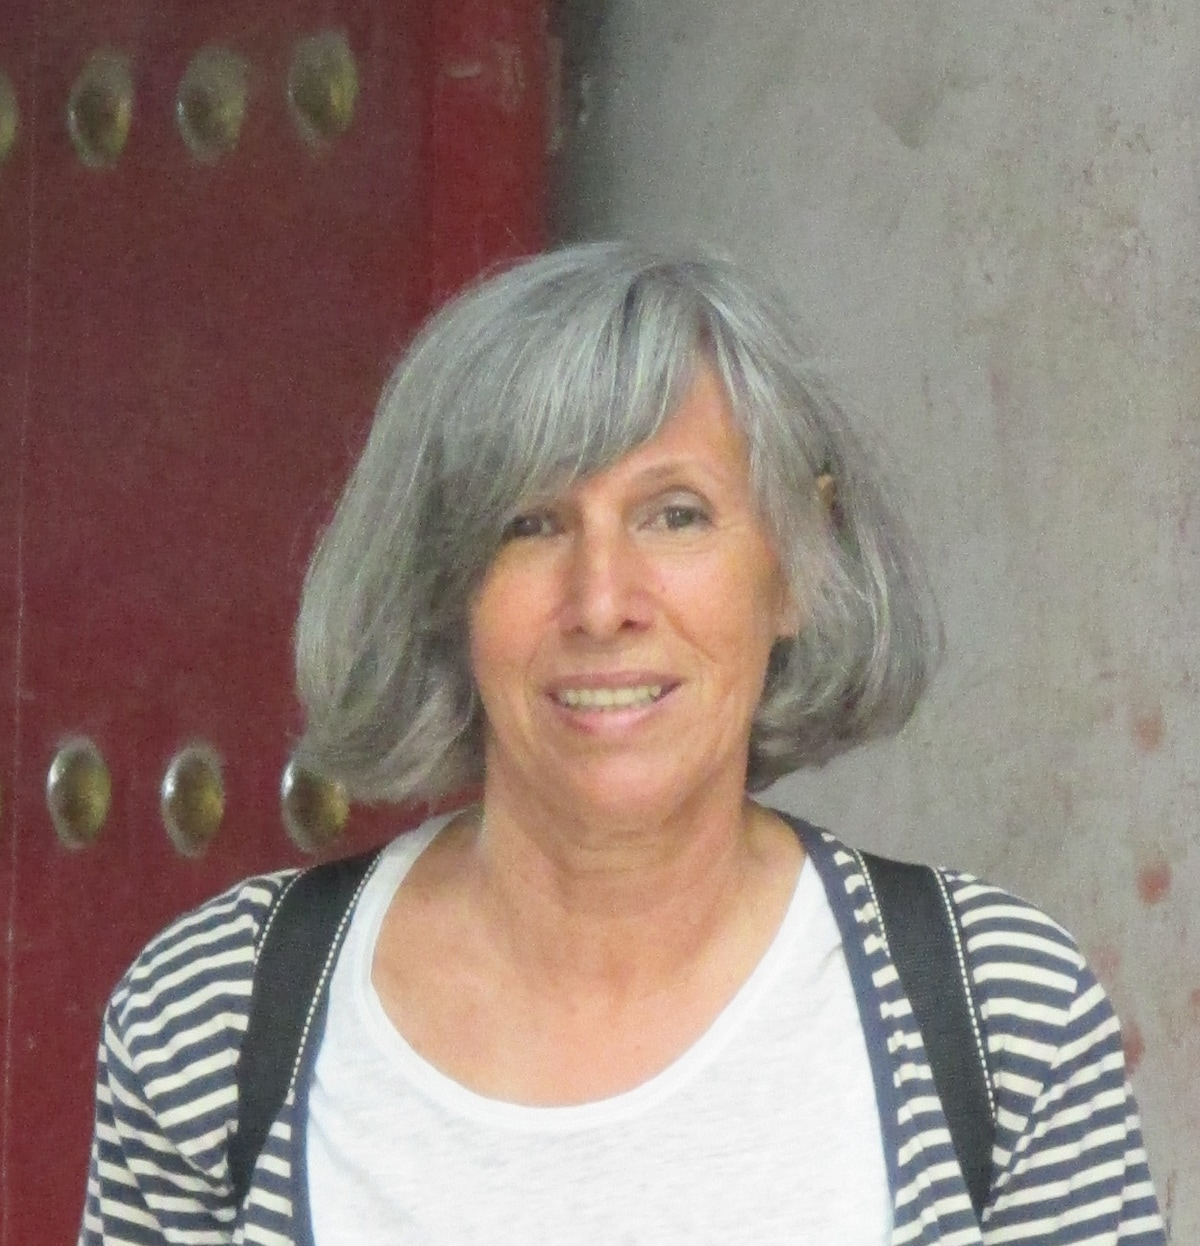 Nicoletta from Roma